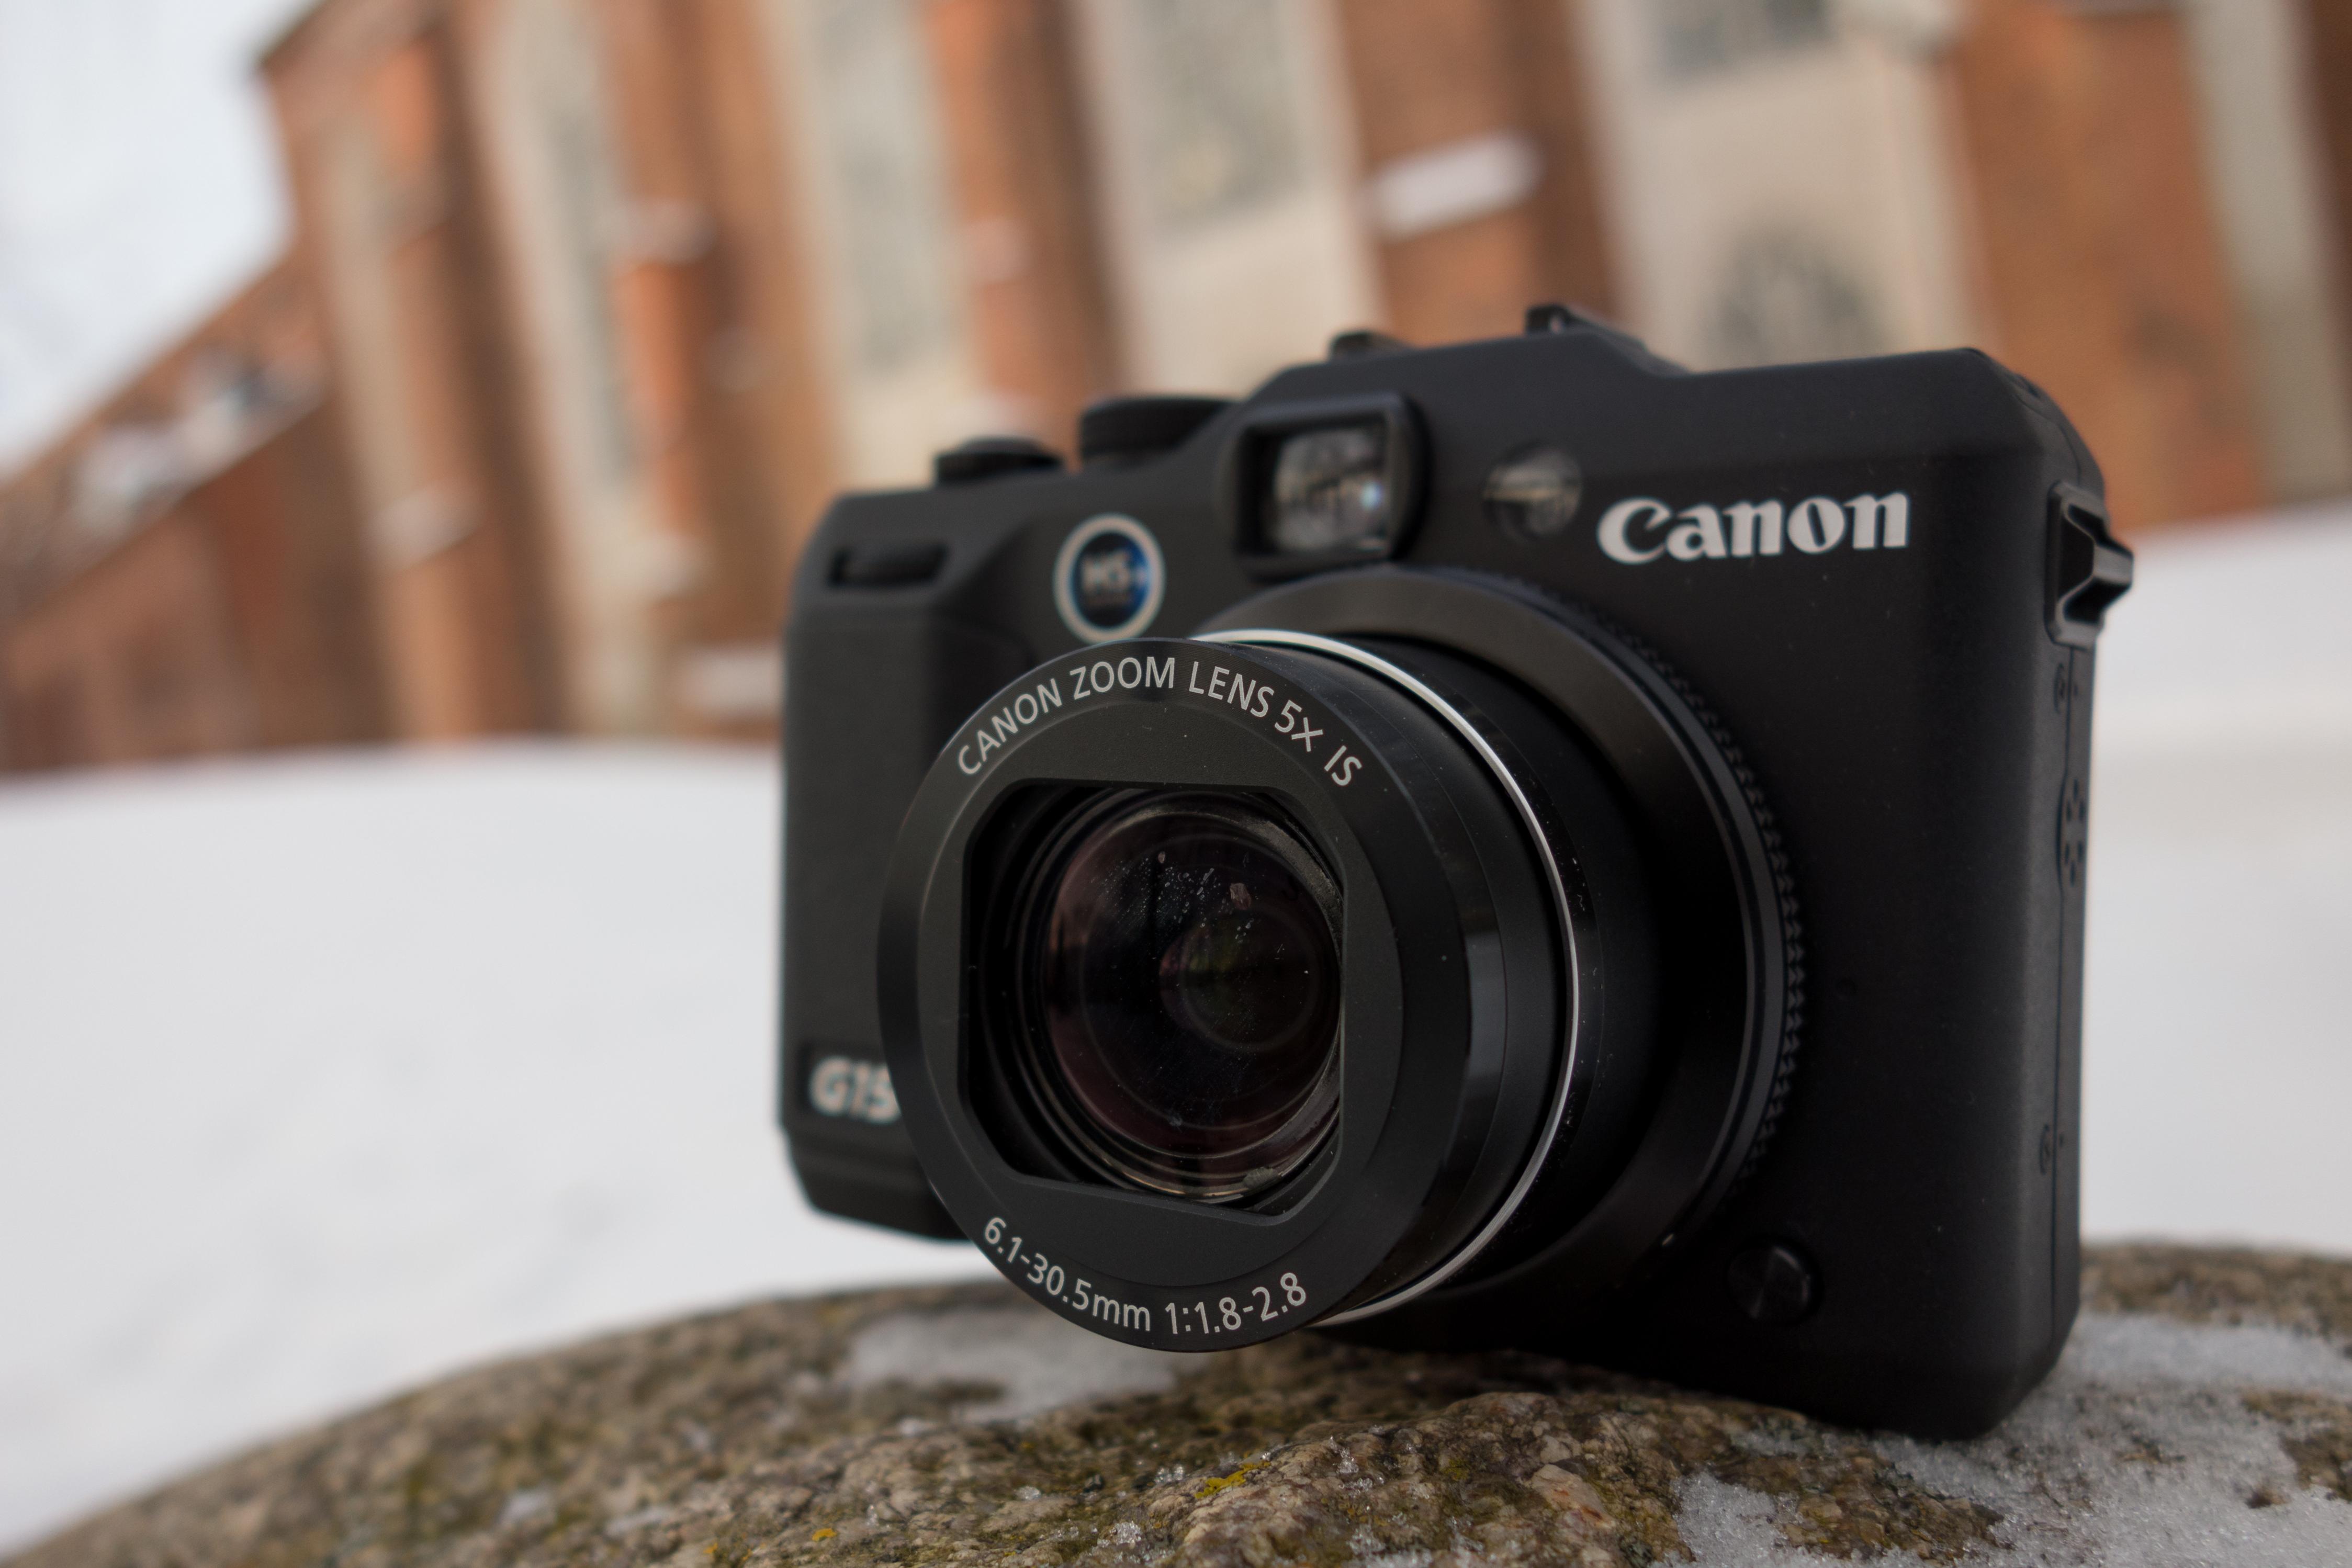 a3272471692 Canon PowerShot G15 ülevaade :: Digitest